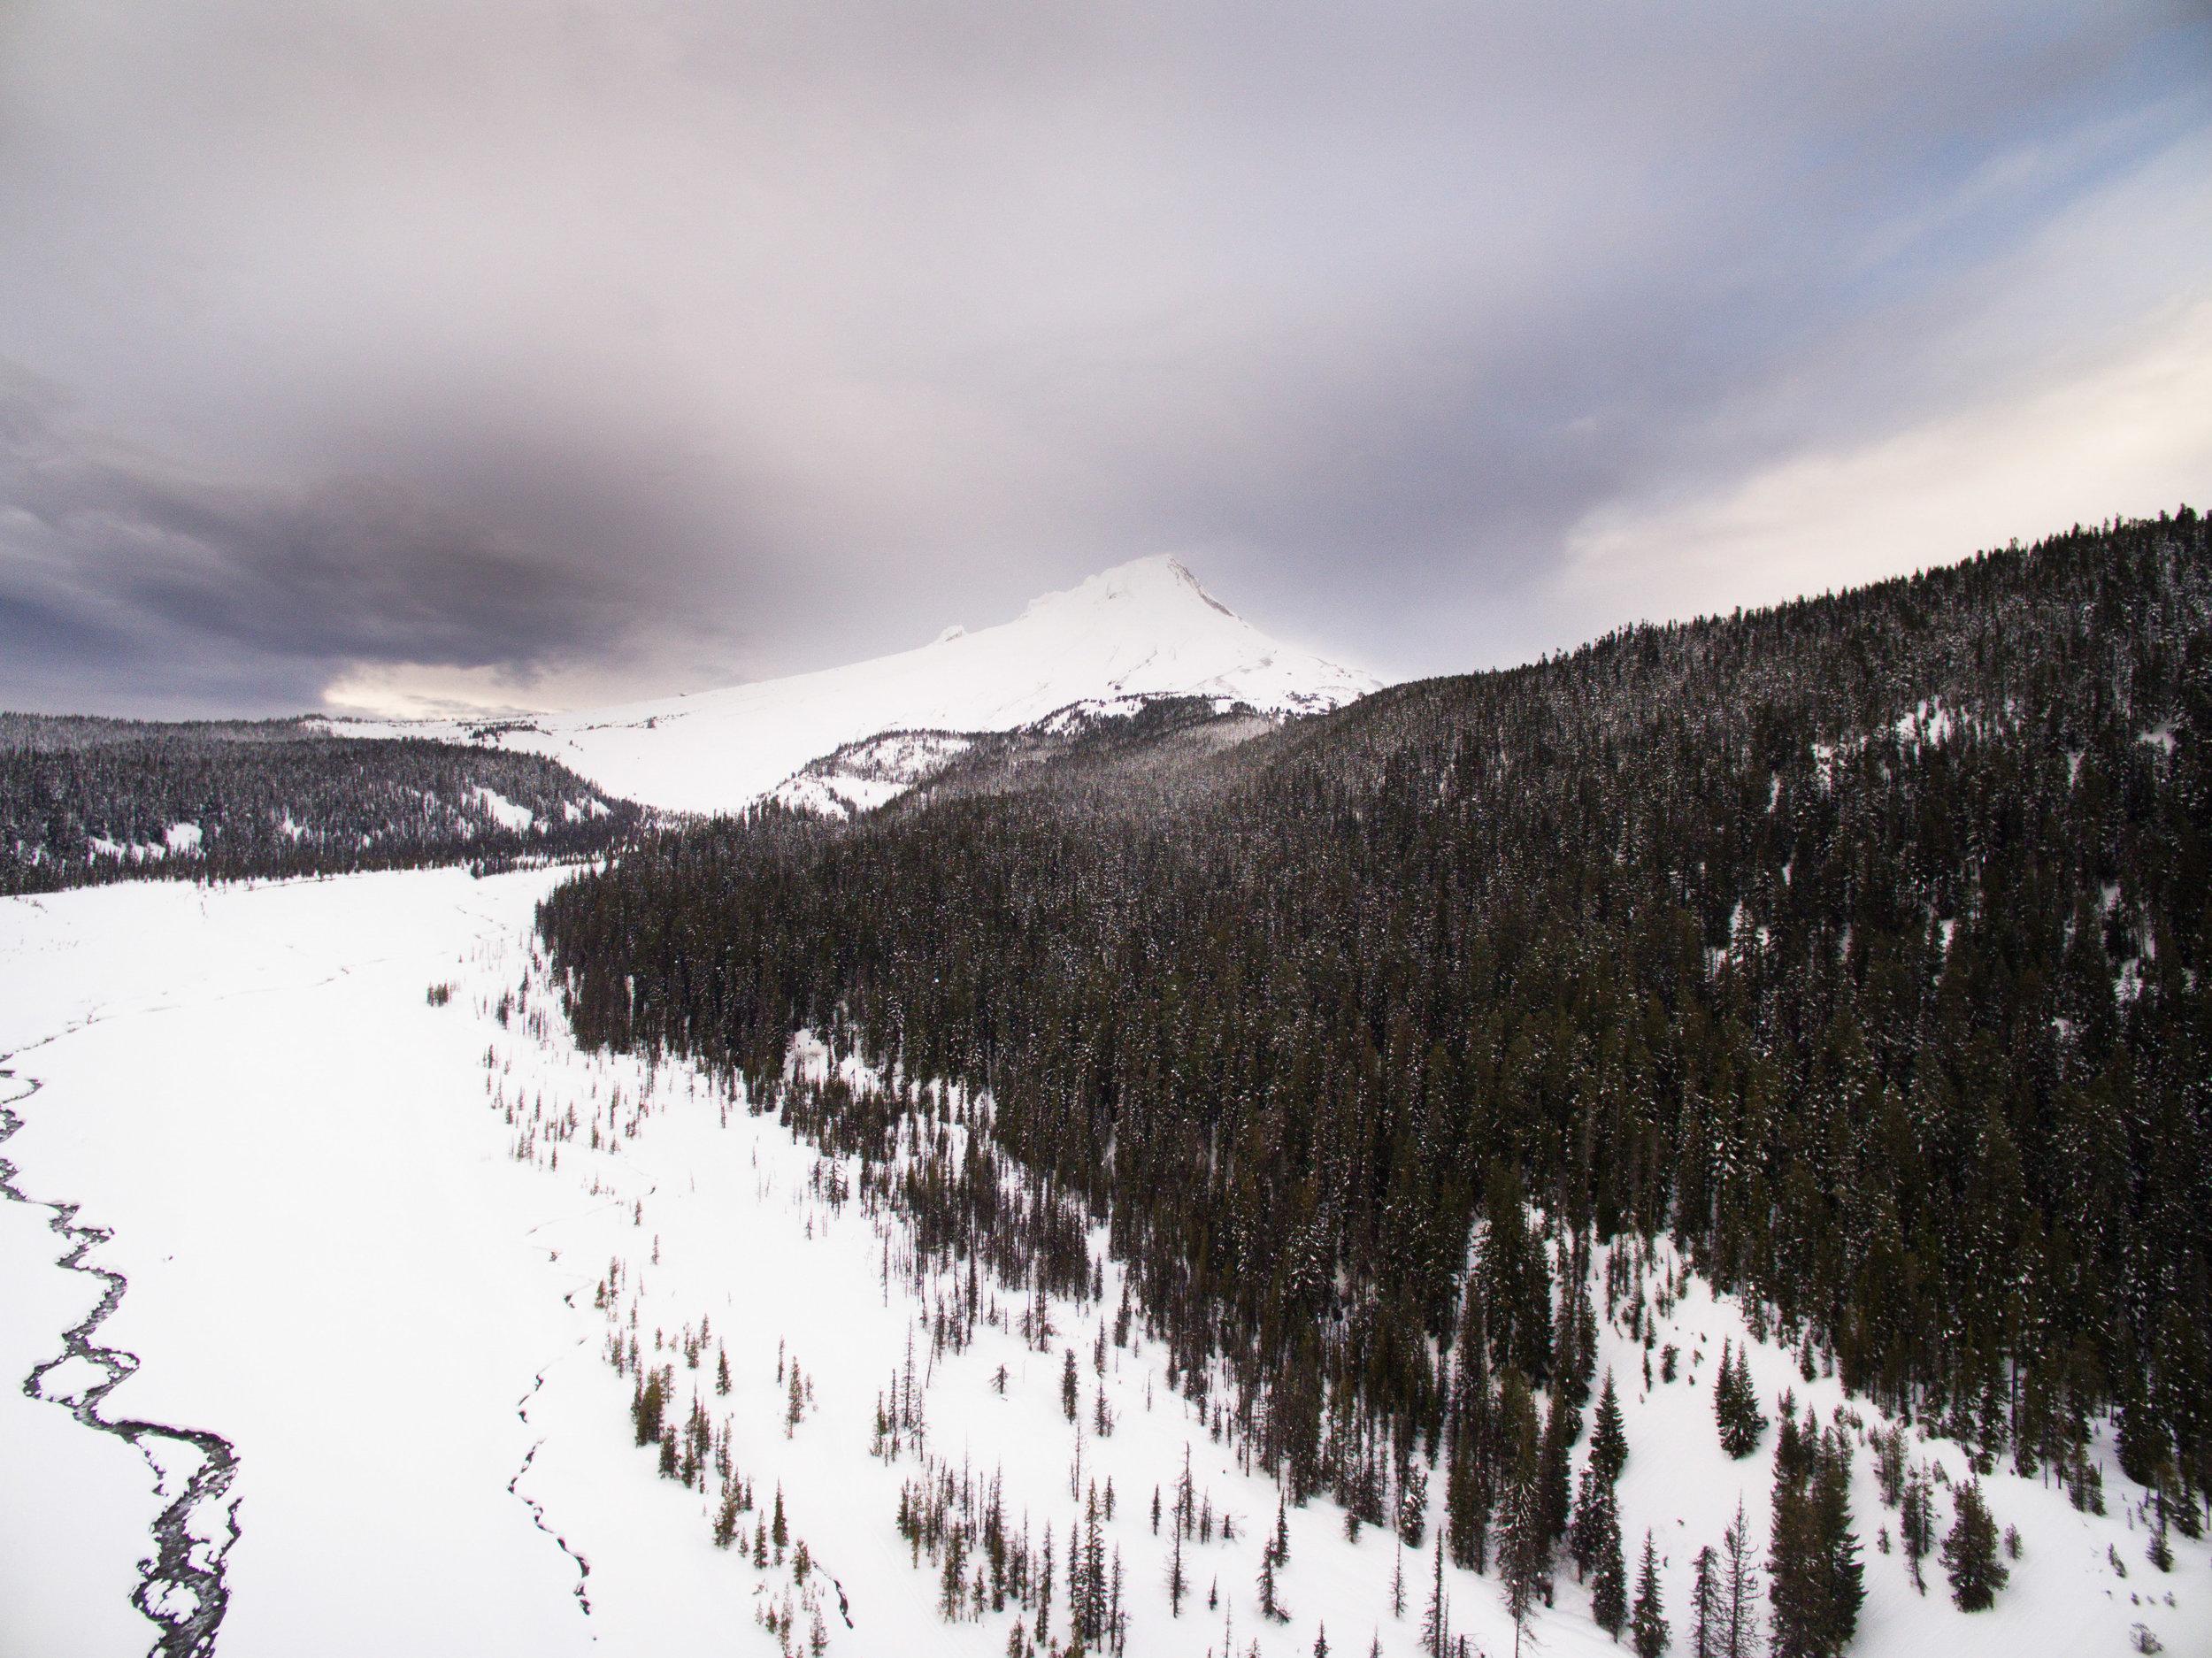 069Travel_Adventure_Outdoor_Photography_Outlive_Creative_Oregon_Mount_Hood.jpg